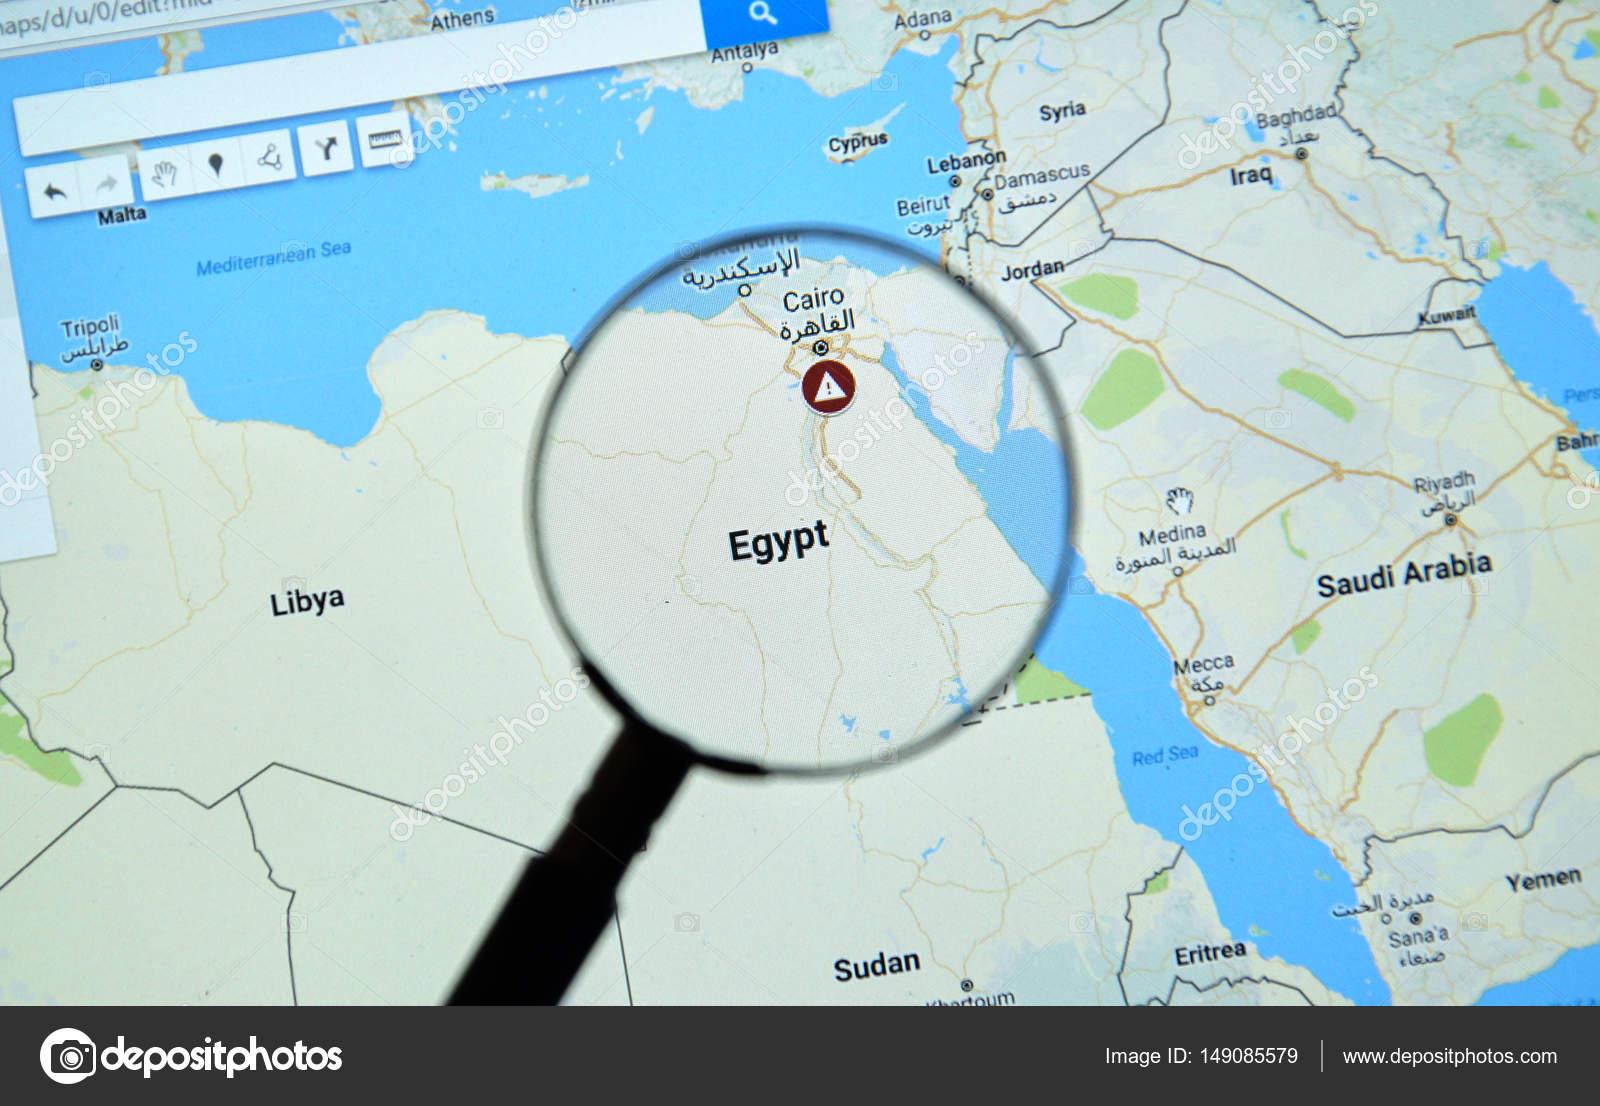 Egypt and Cairo on Google Maps – Stock Editorial Photo © dennizn ...